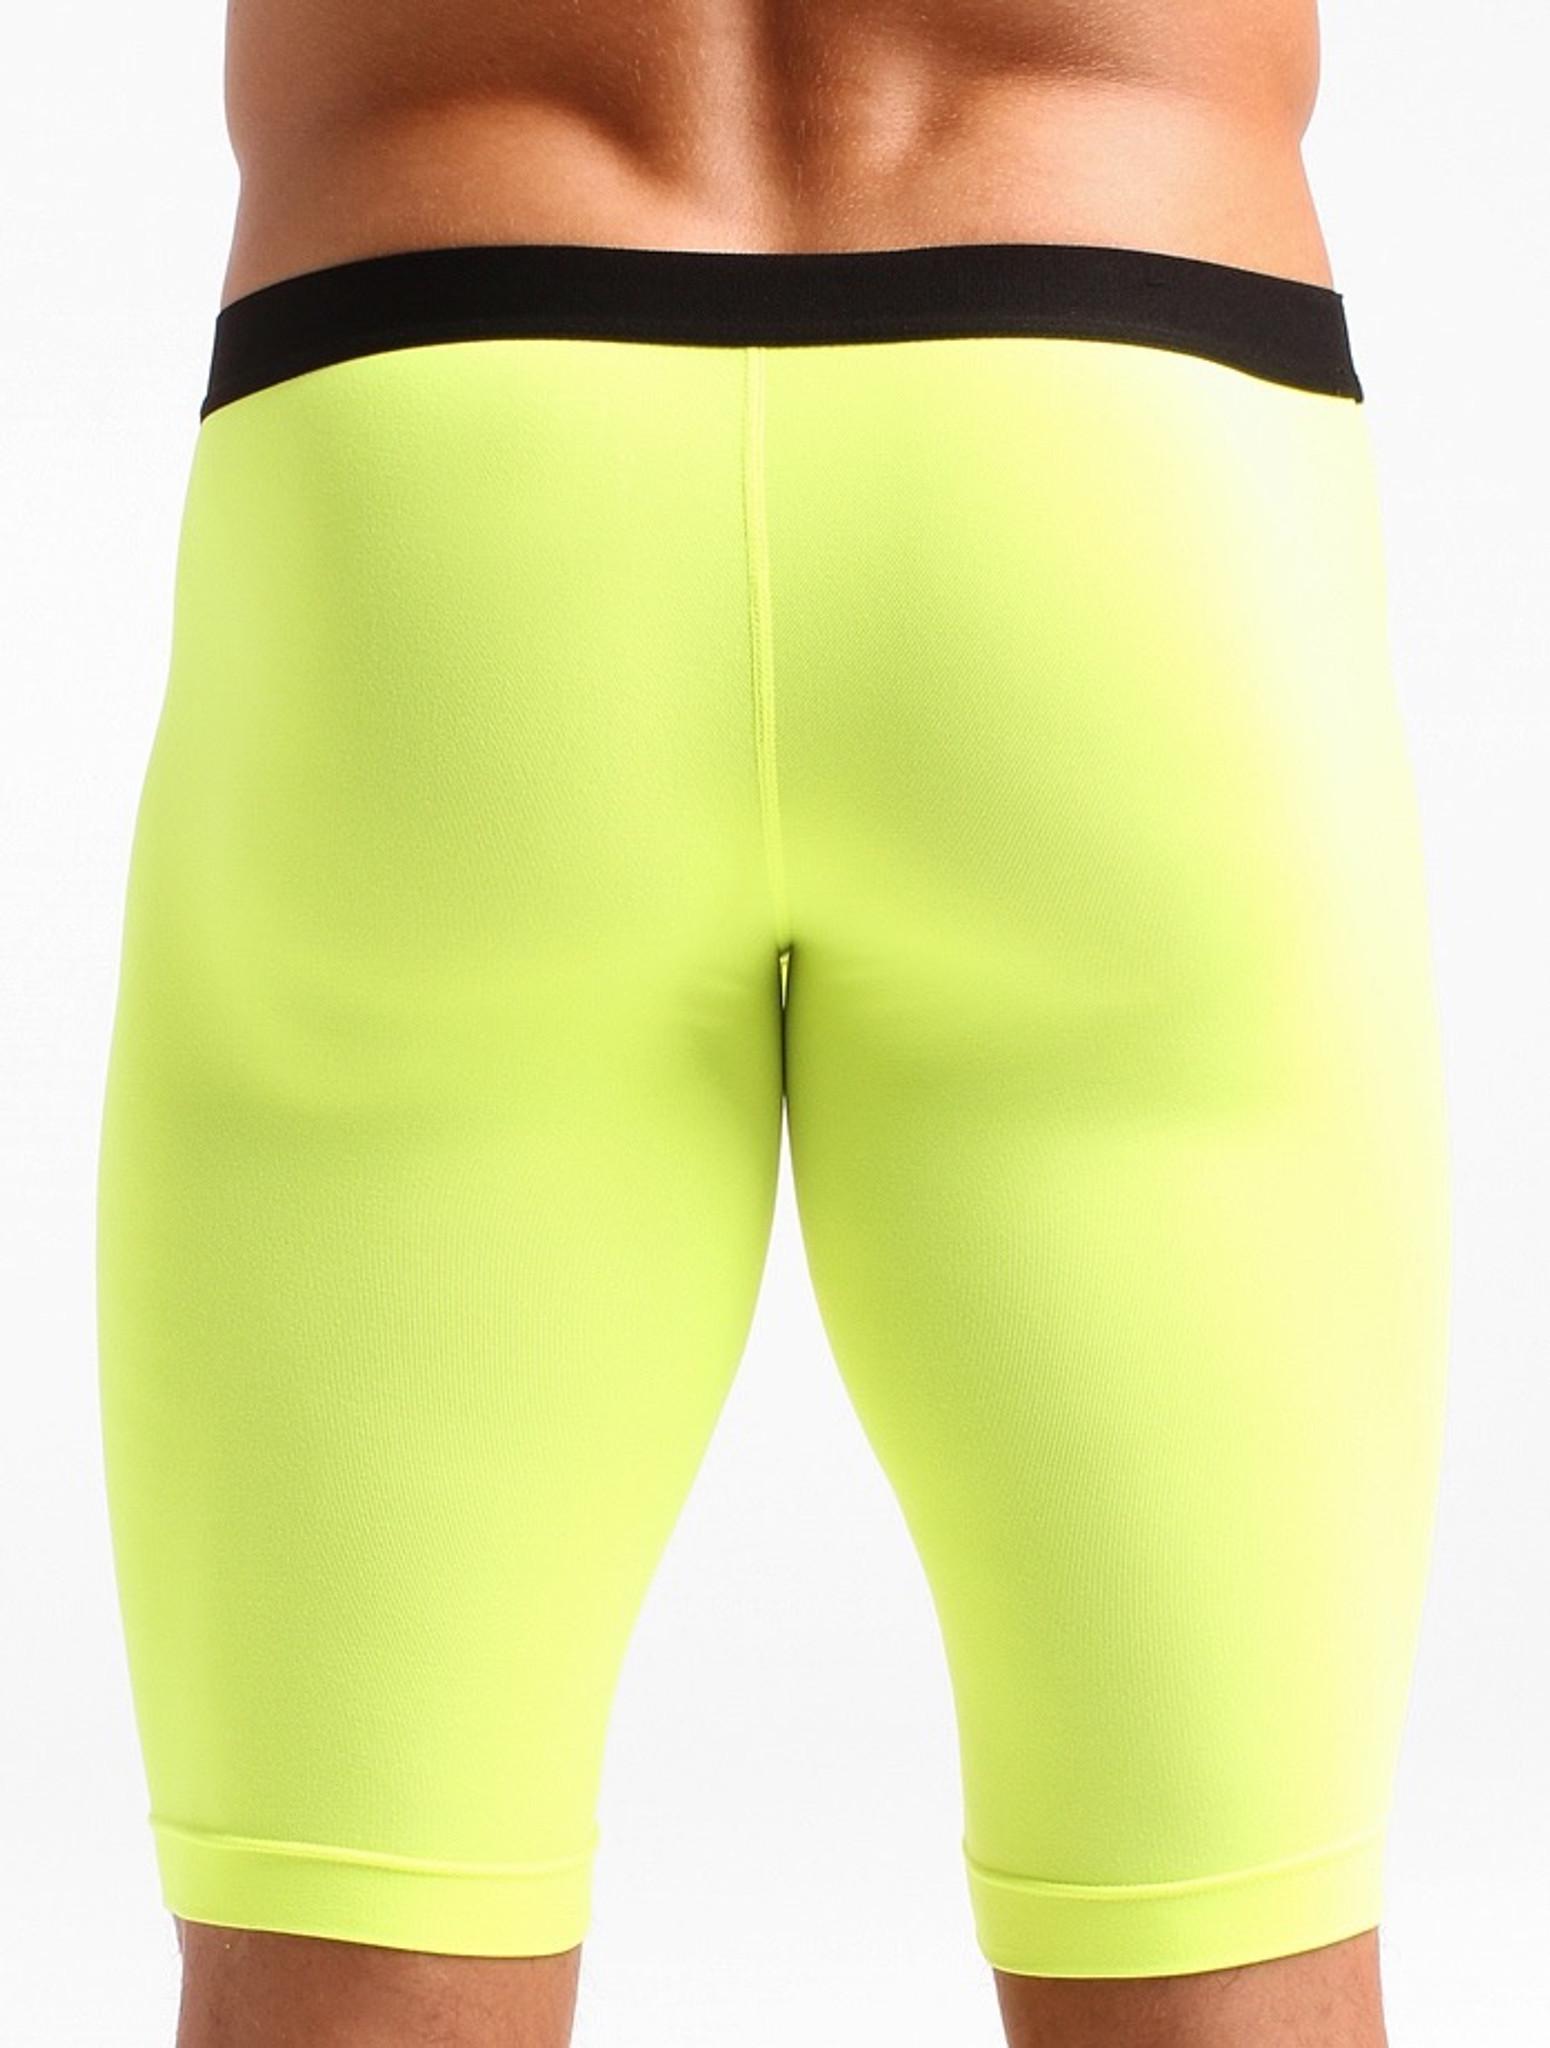 Men's Underwear – CX93 Long boxer knee length sports boxer